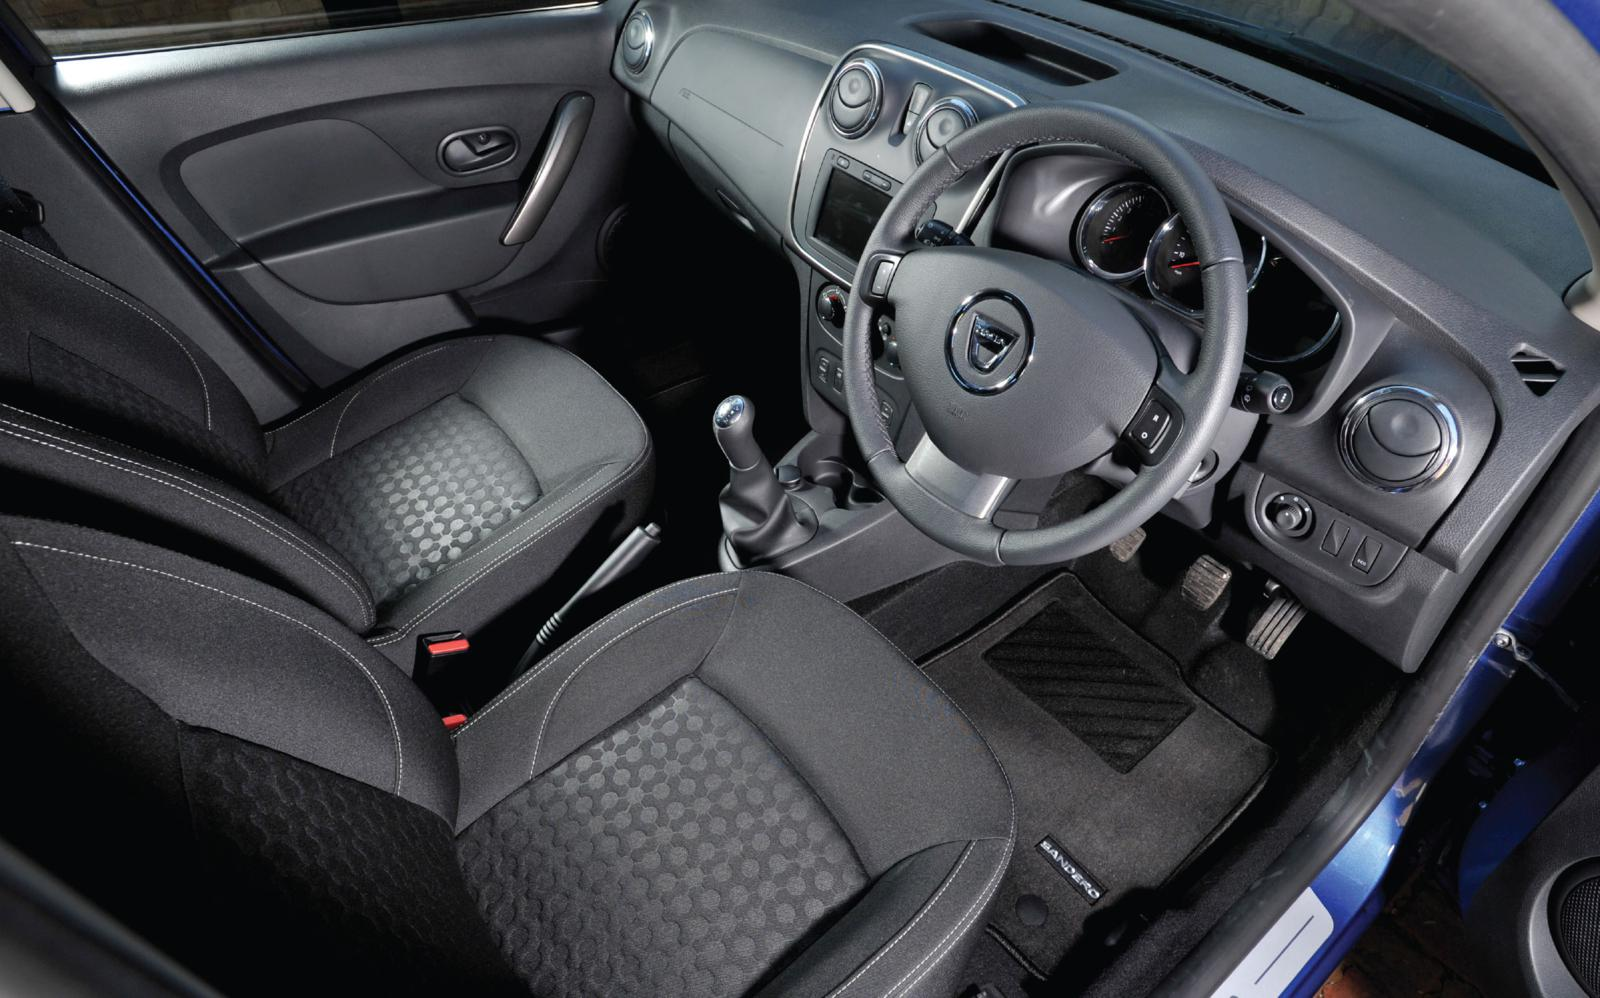 Dacia Sandero Laureate 2013 Interior Front Seat Driver